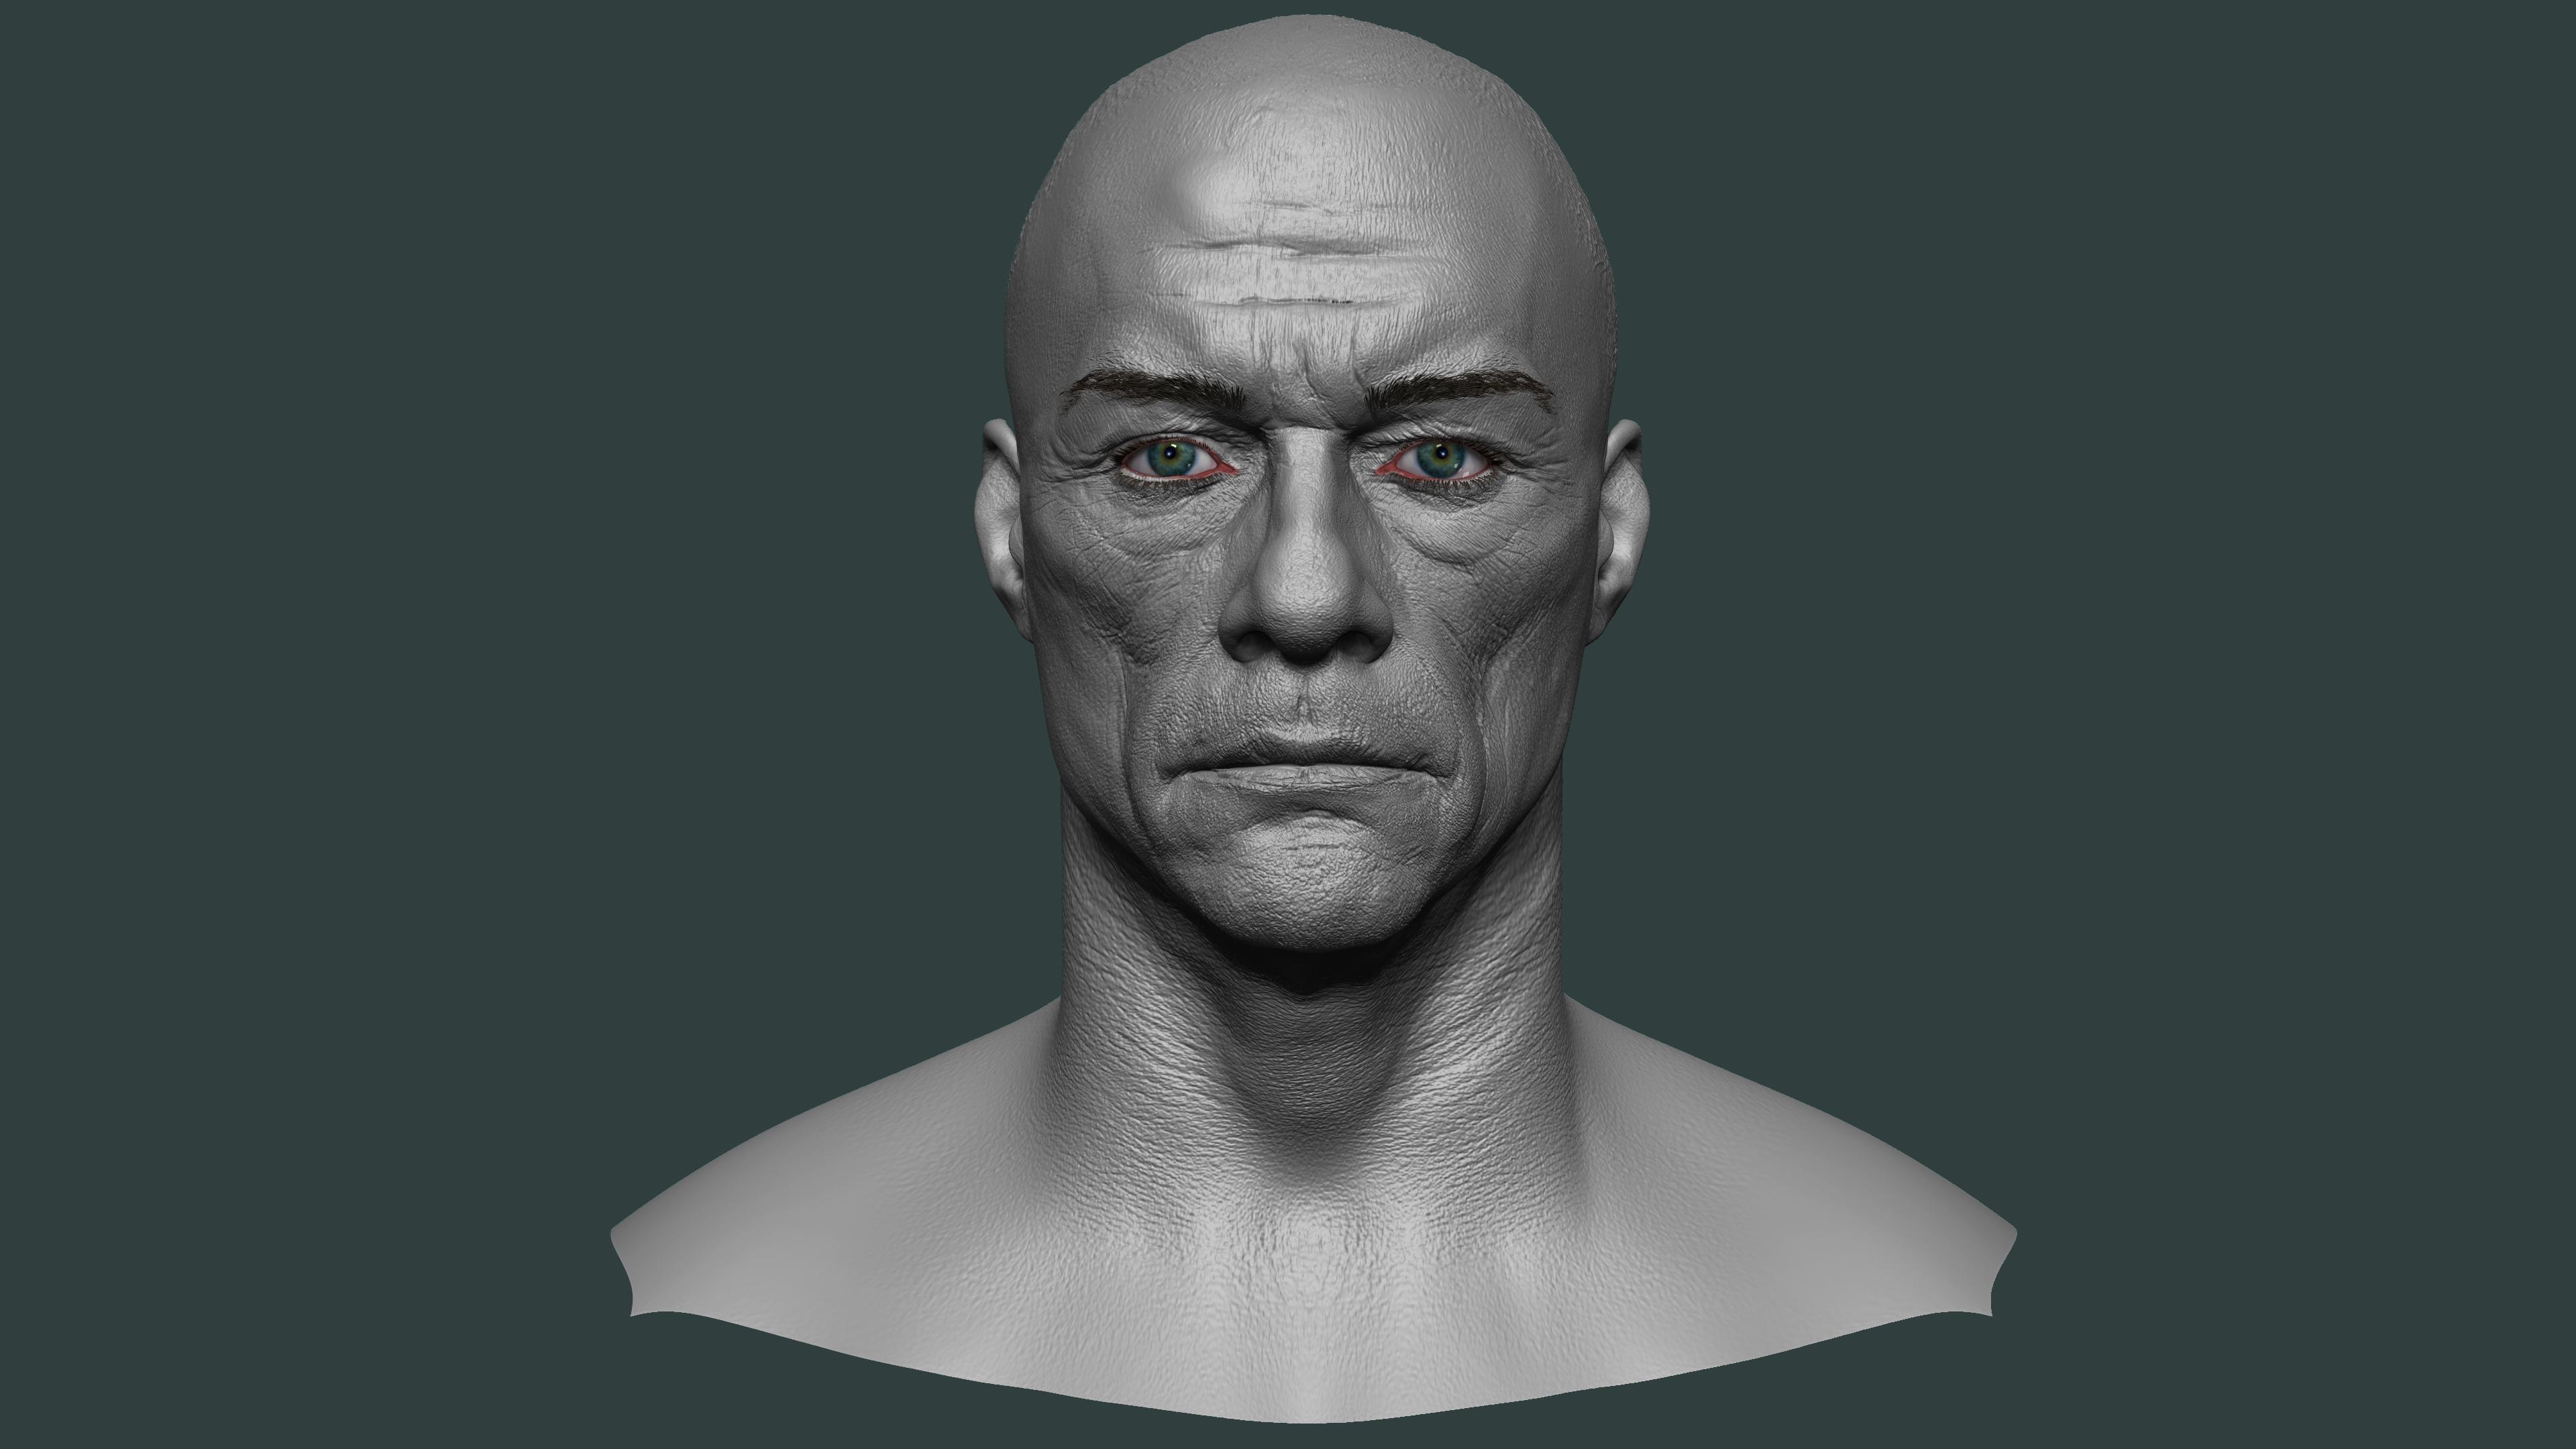 10 ways to improve your 3D anatomy | Creative Bloq